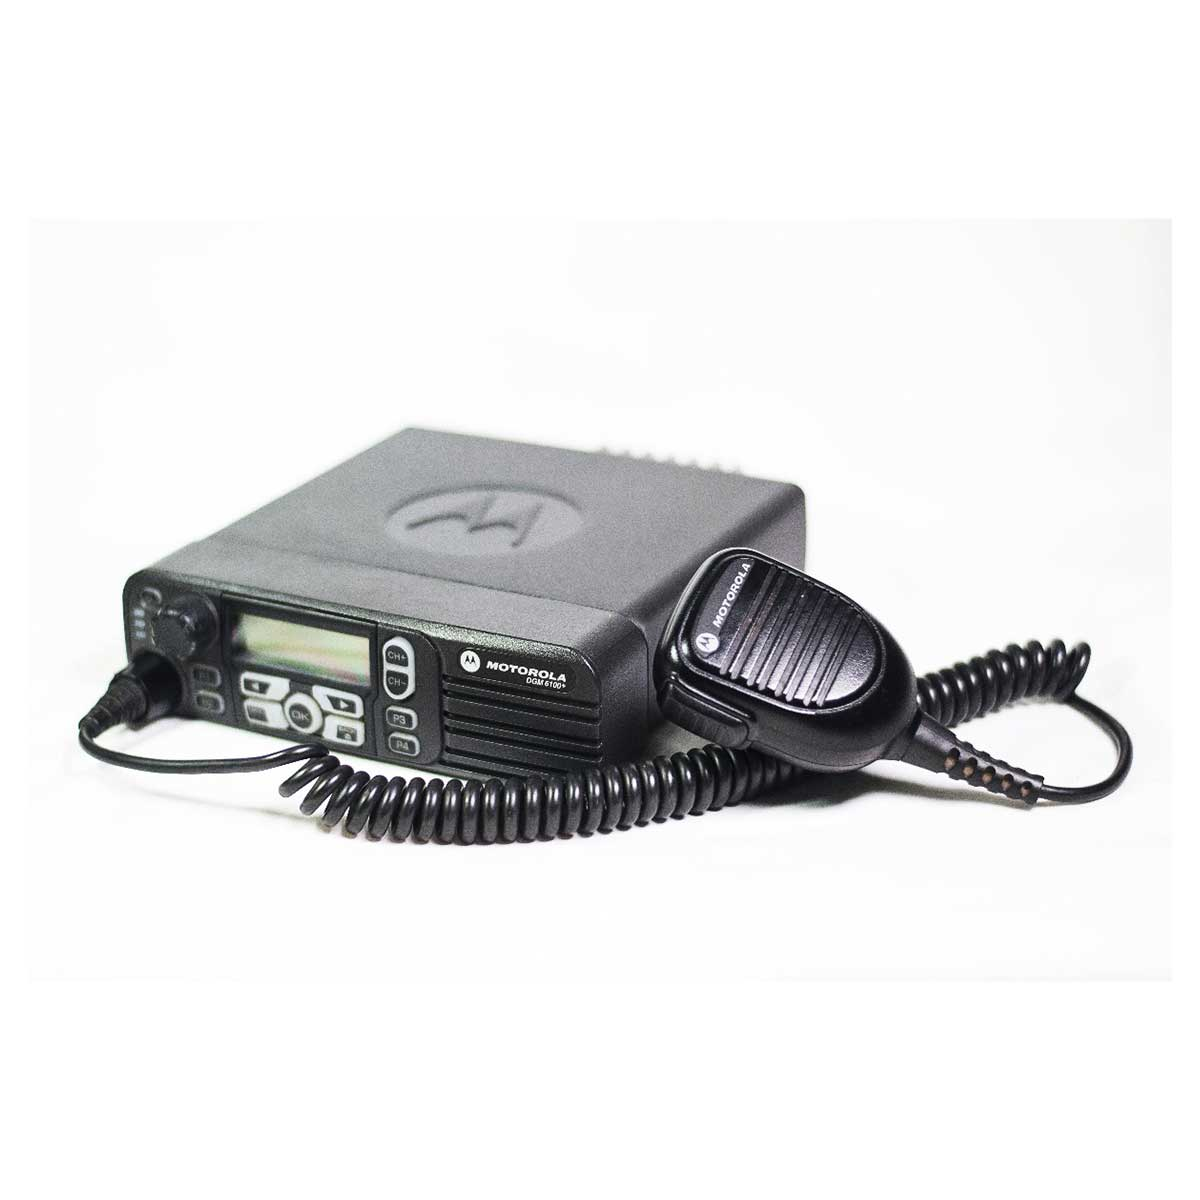 Radio Motorola DGM6100 Digital LAM27TPH9LA1AN UHF 450-527 MHZ